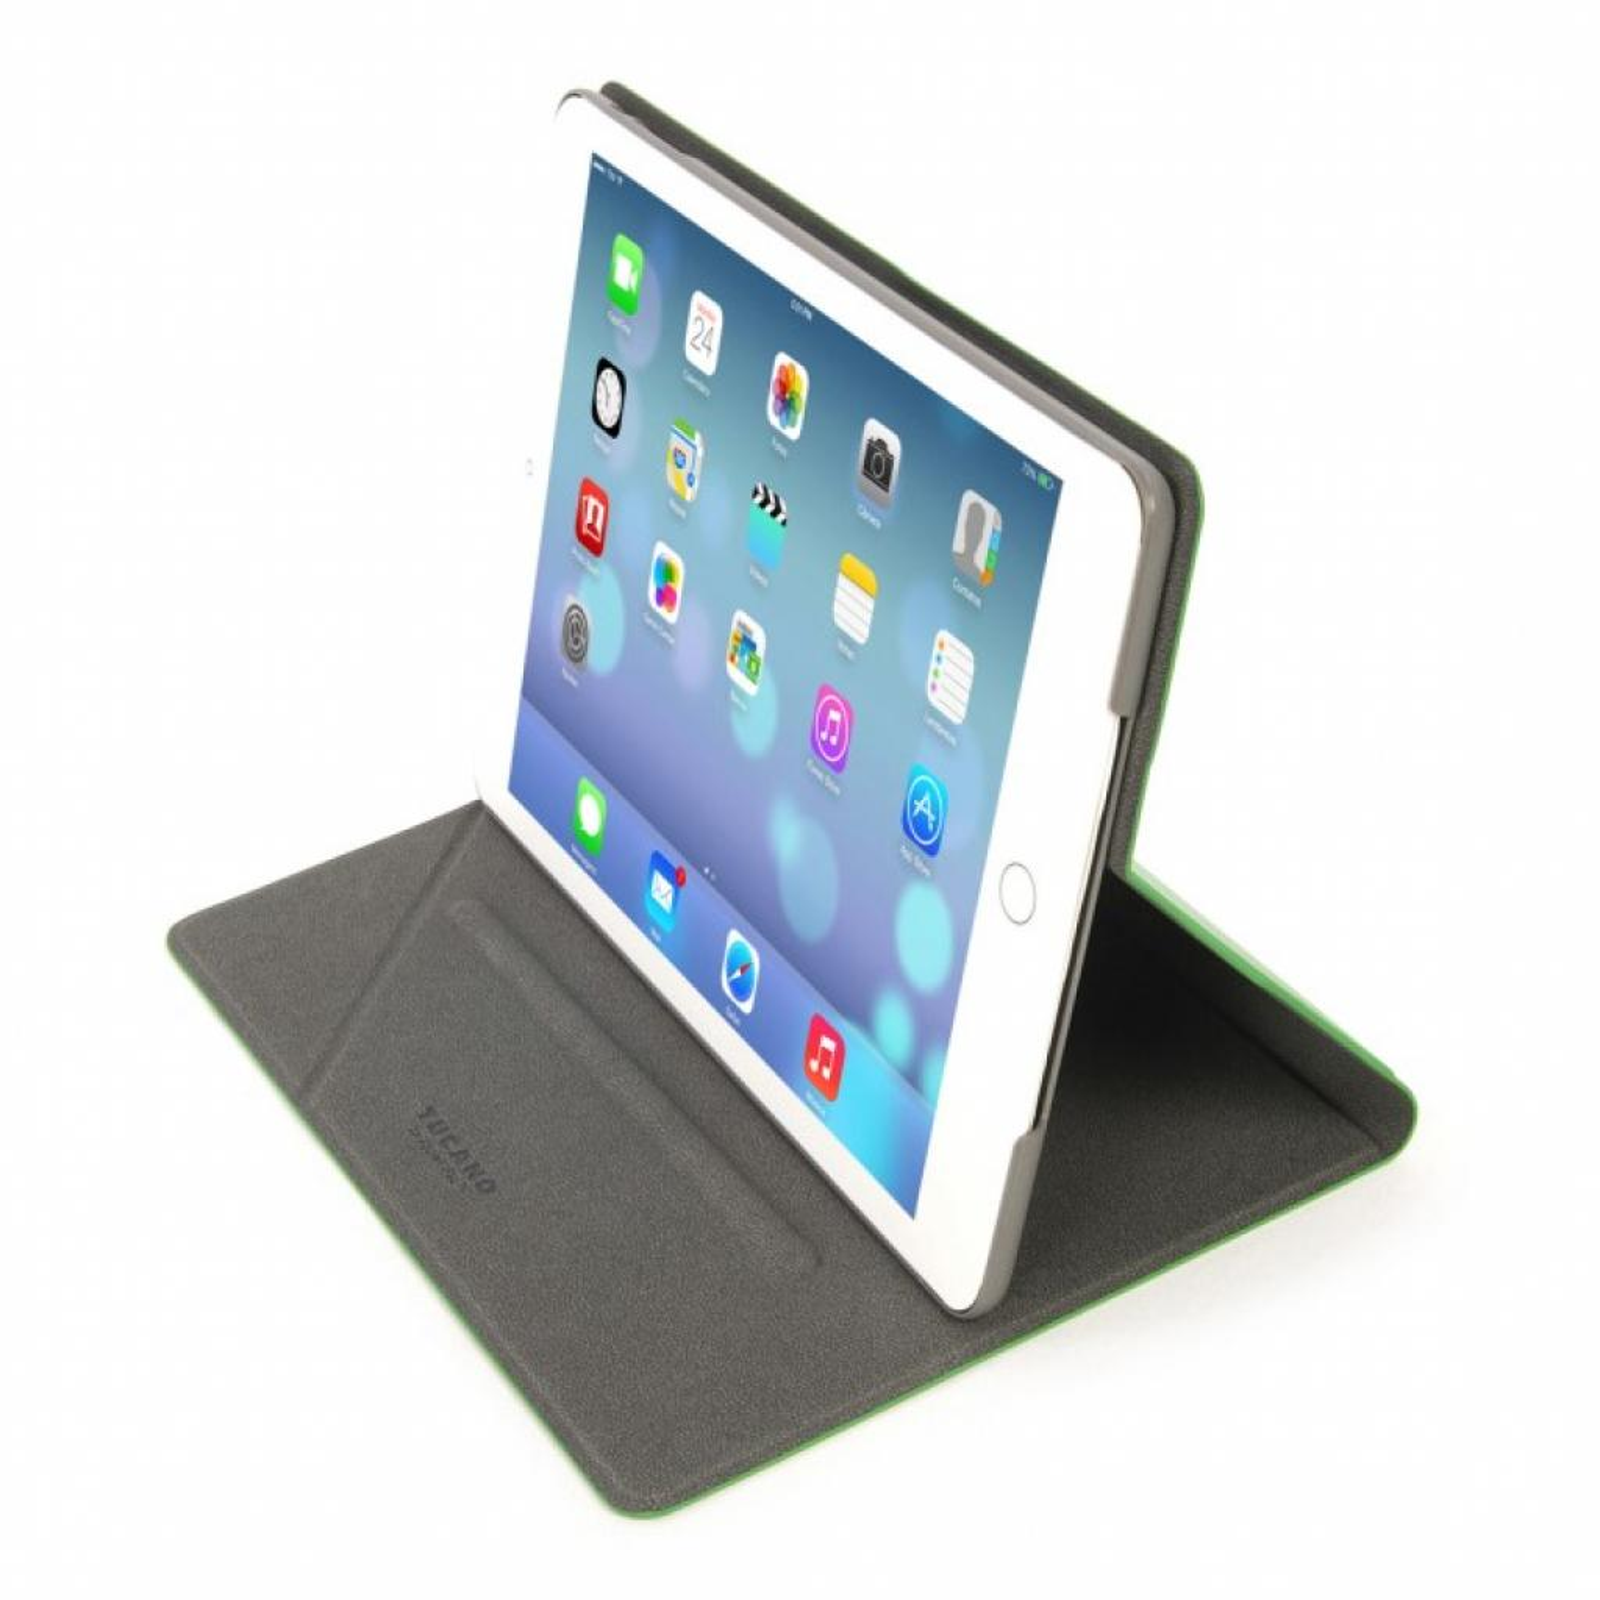 Чехол для планшета Tucano iPad Air Angolo Green (IPD5AN-V) изображение 3